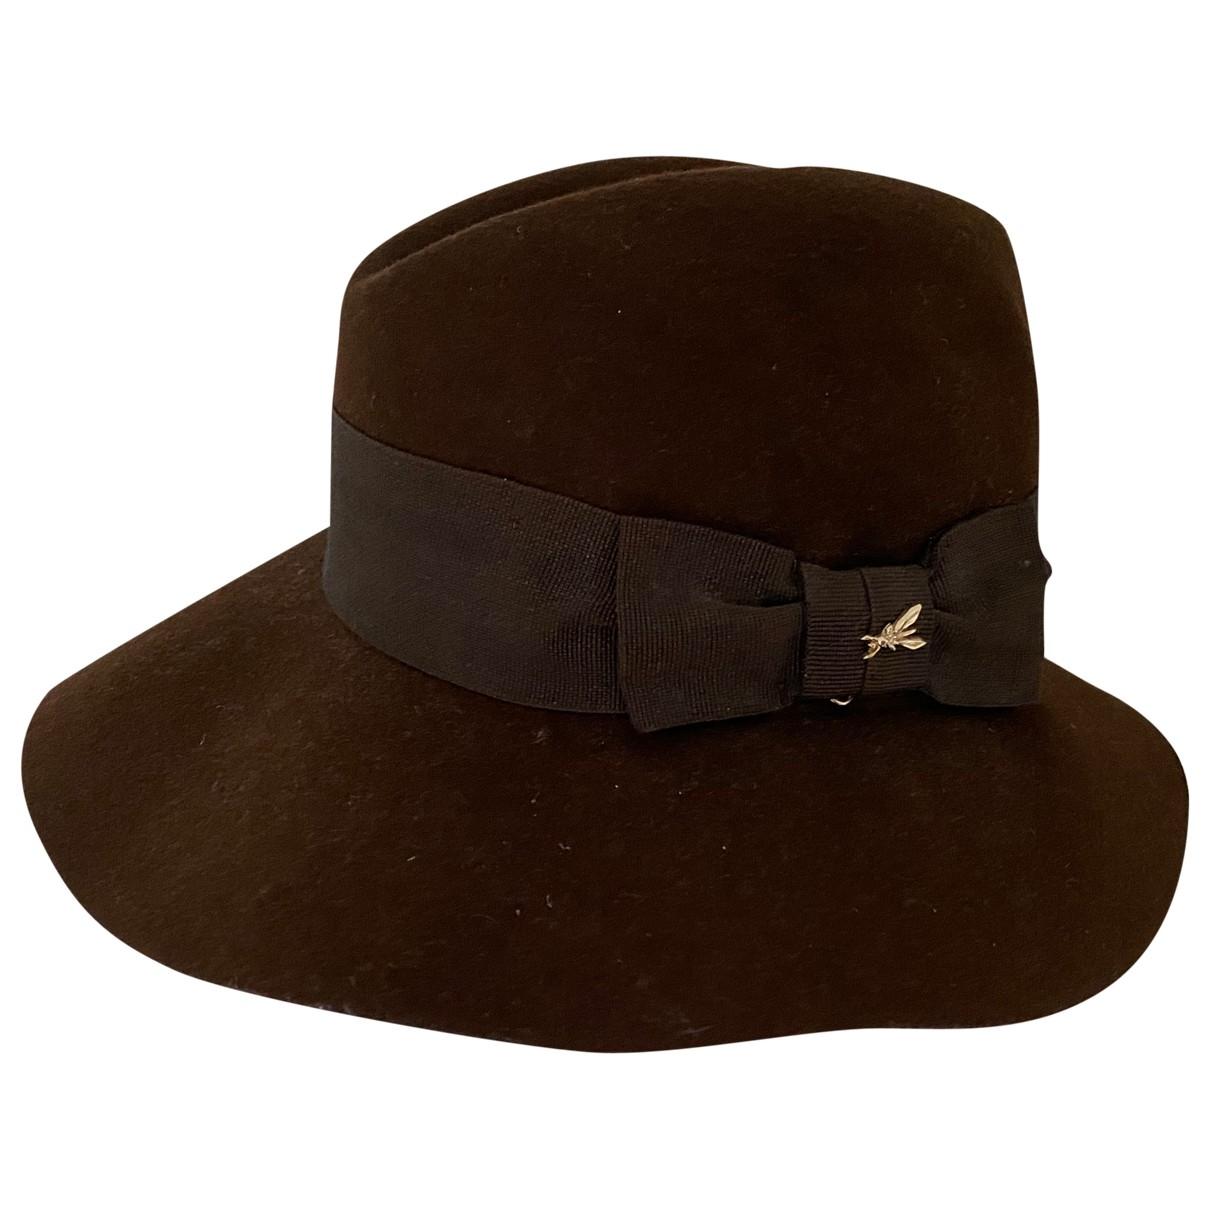 Patrizia Pepe \N Brown Wool hat for Women M International